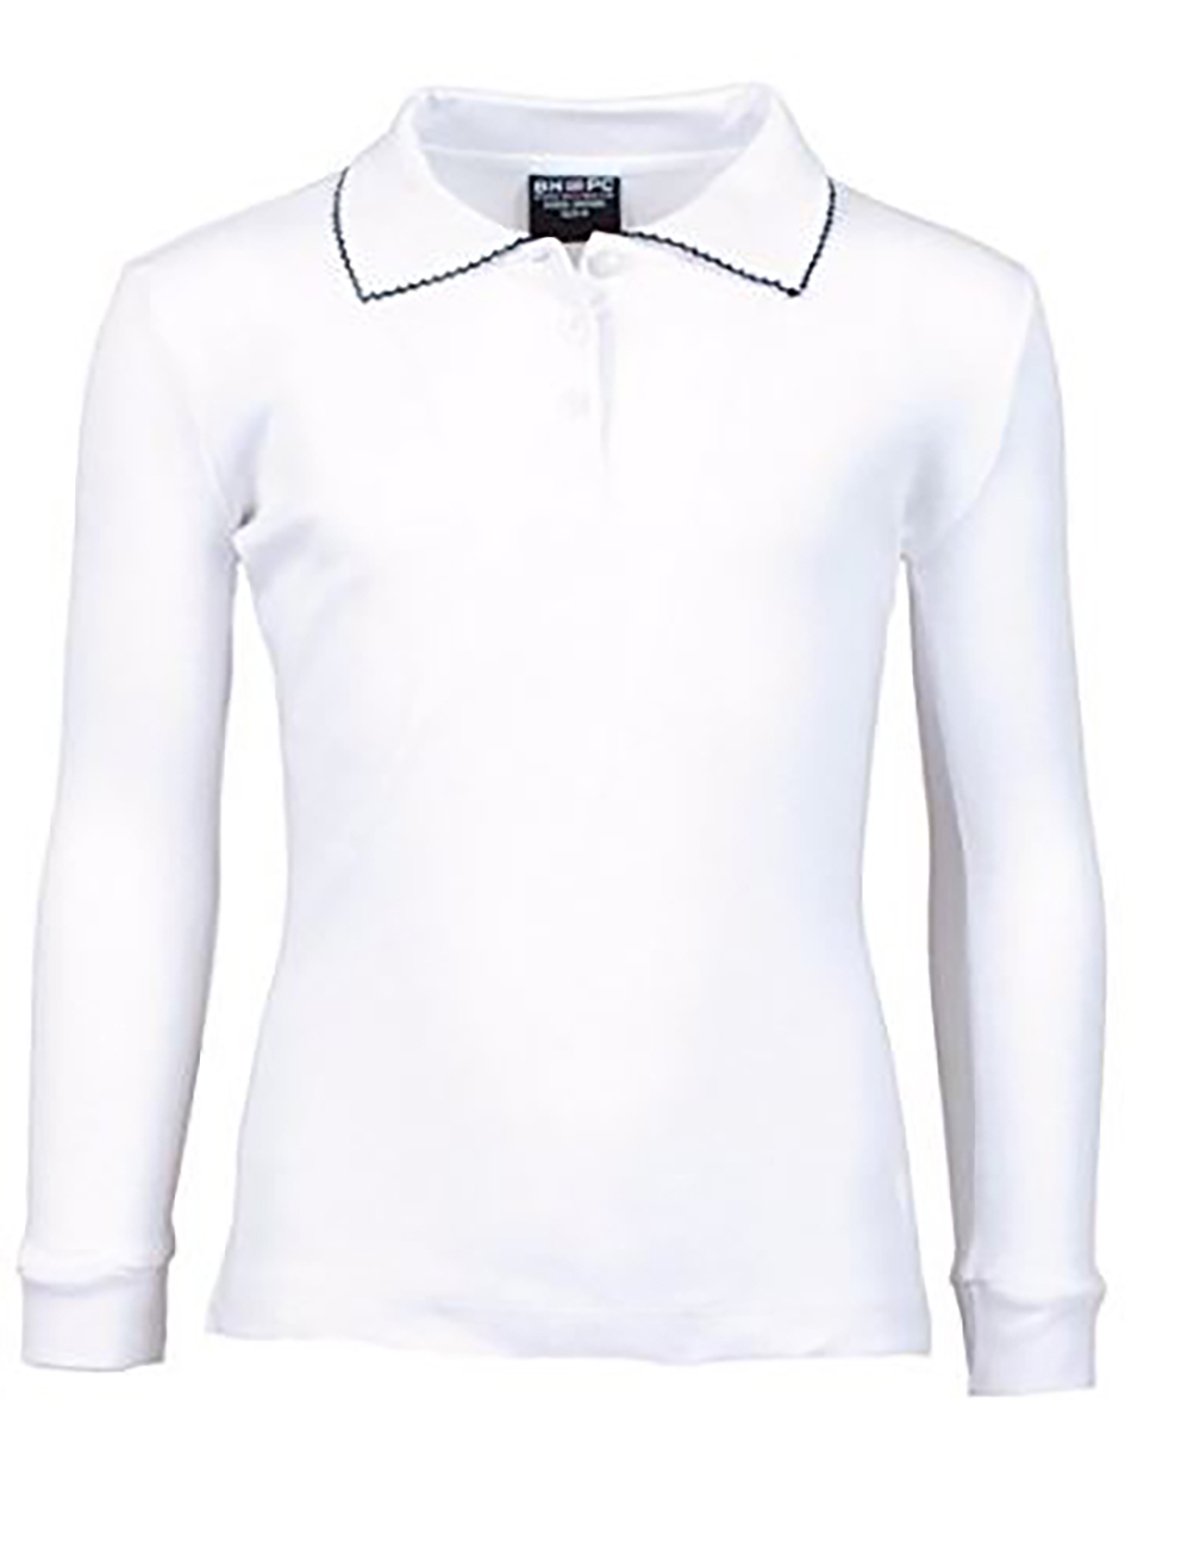 Girl's Uniform Long Sleeve with Contrast Trim Polo